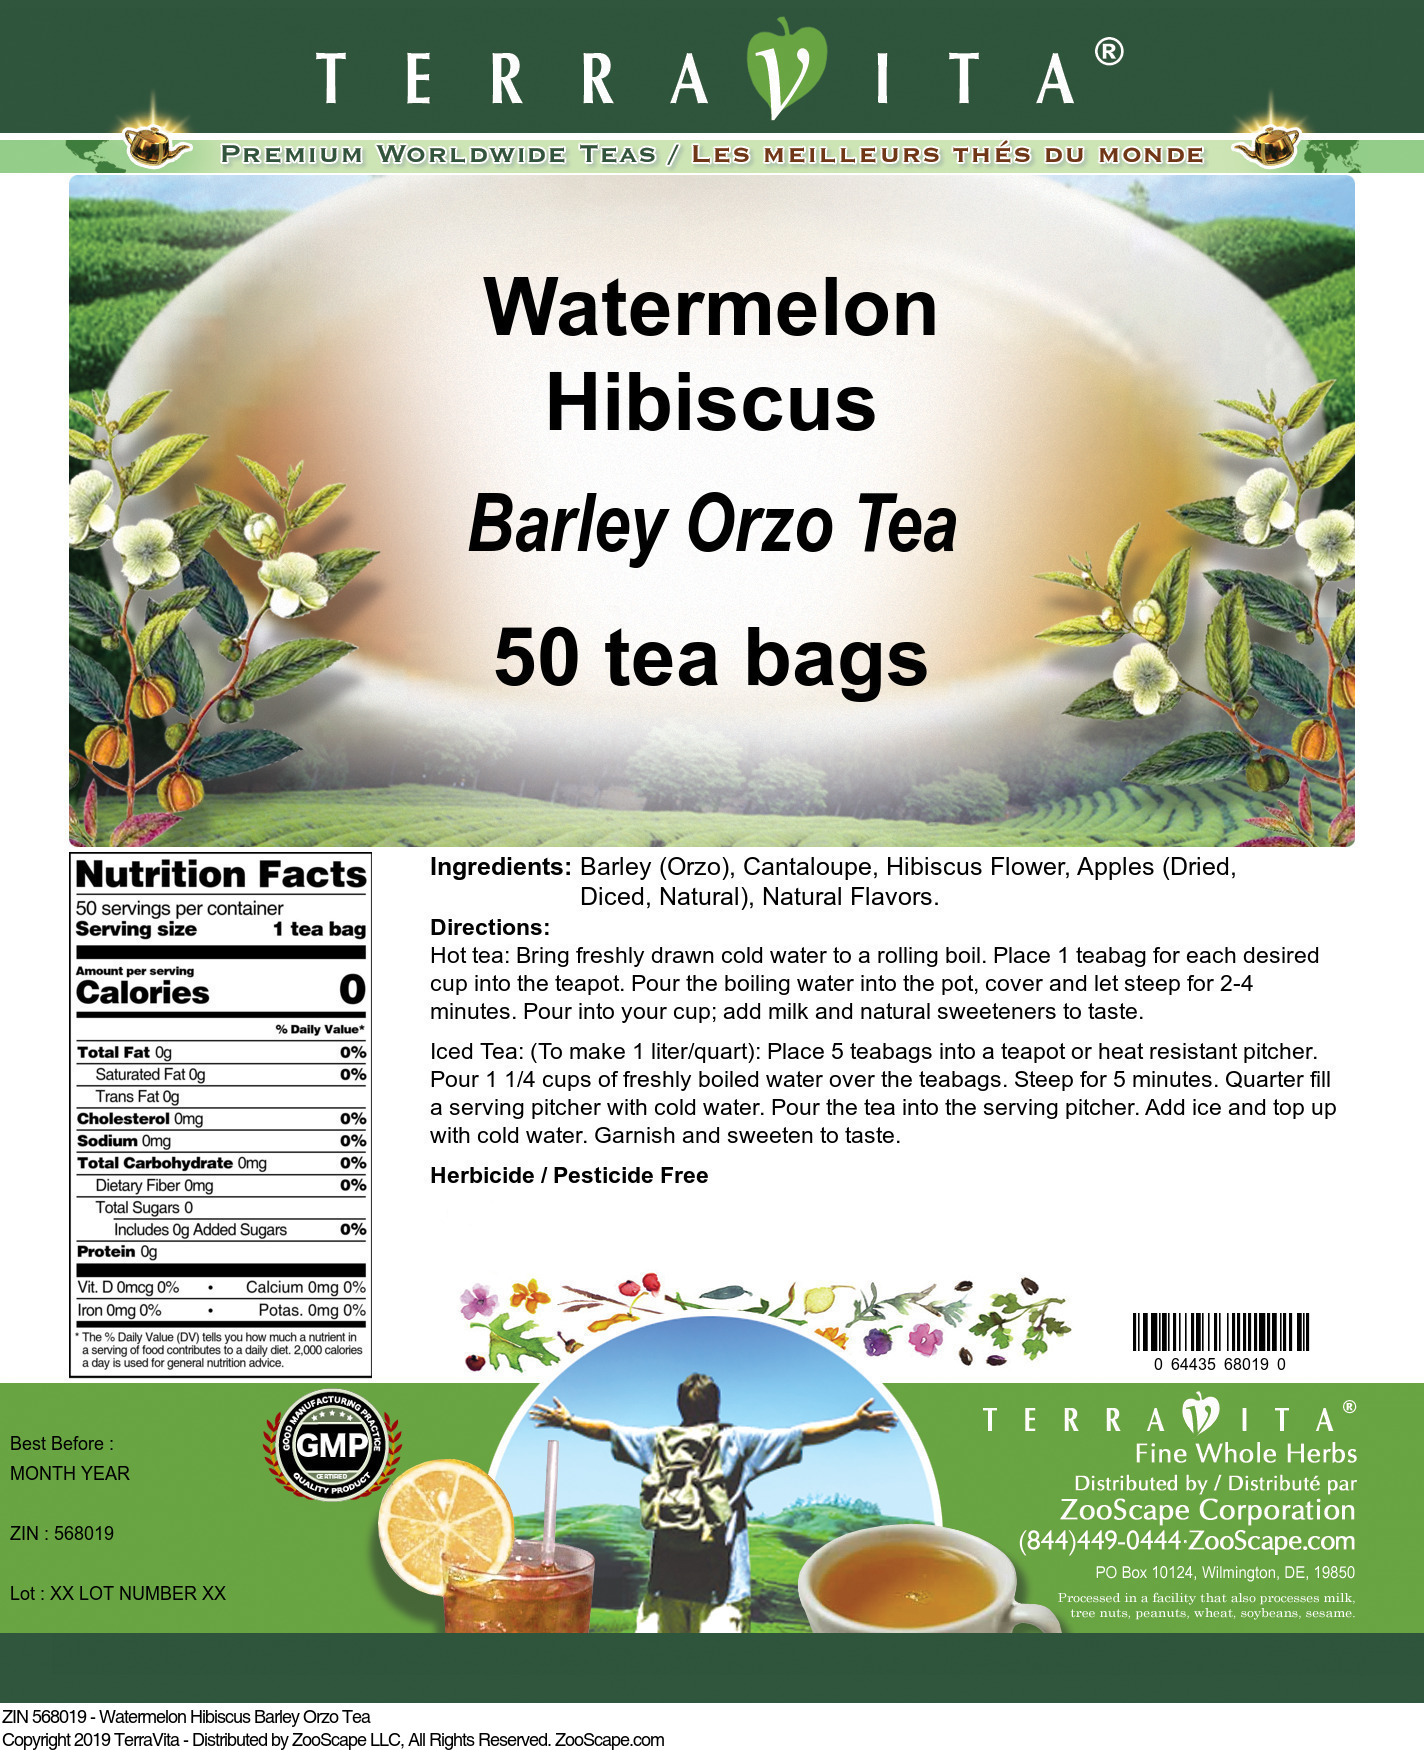 Watermelon Hibiscus Barley Orzo